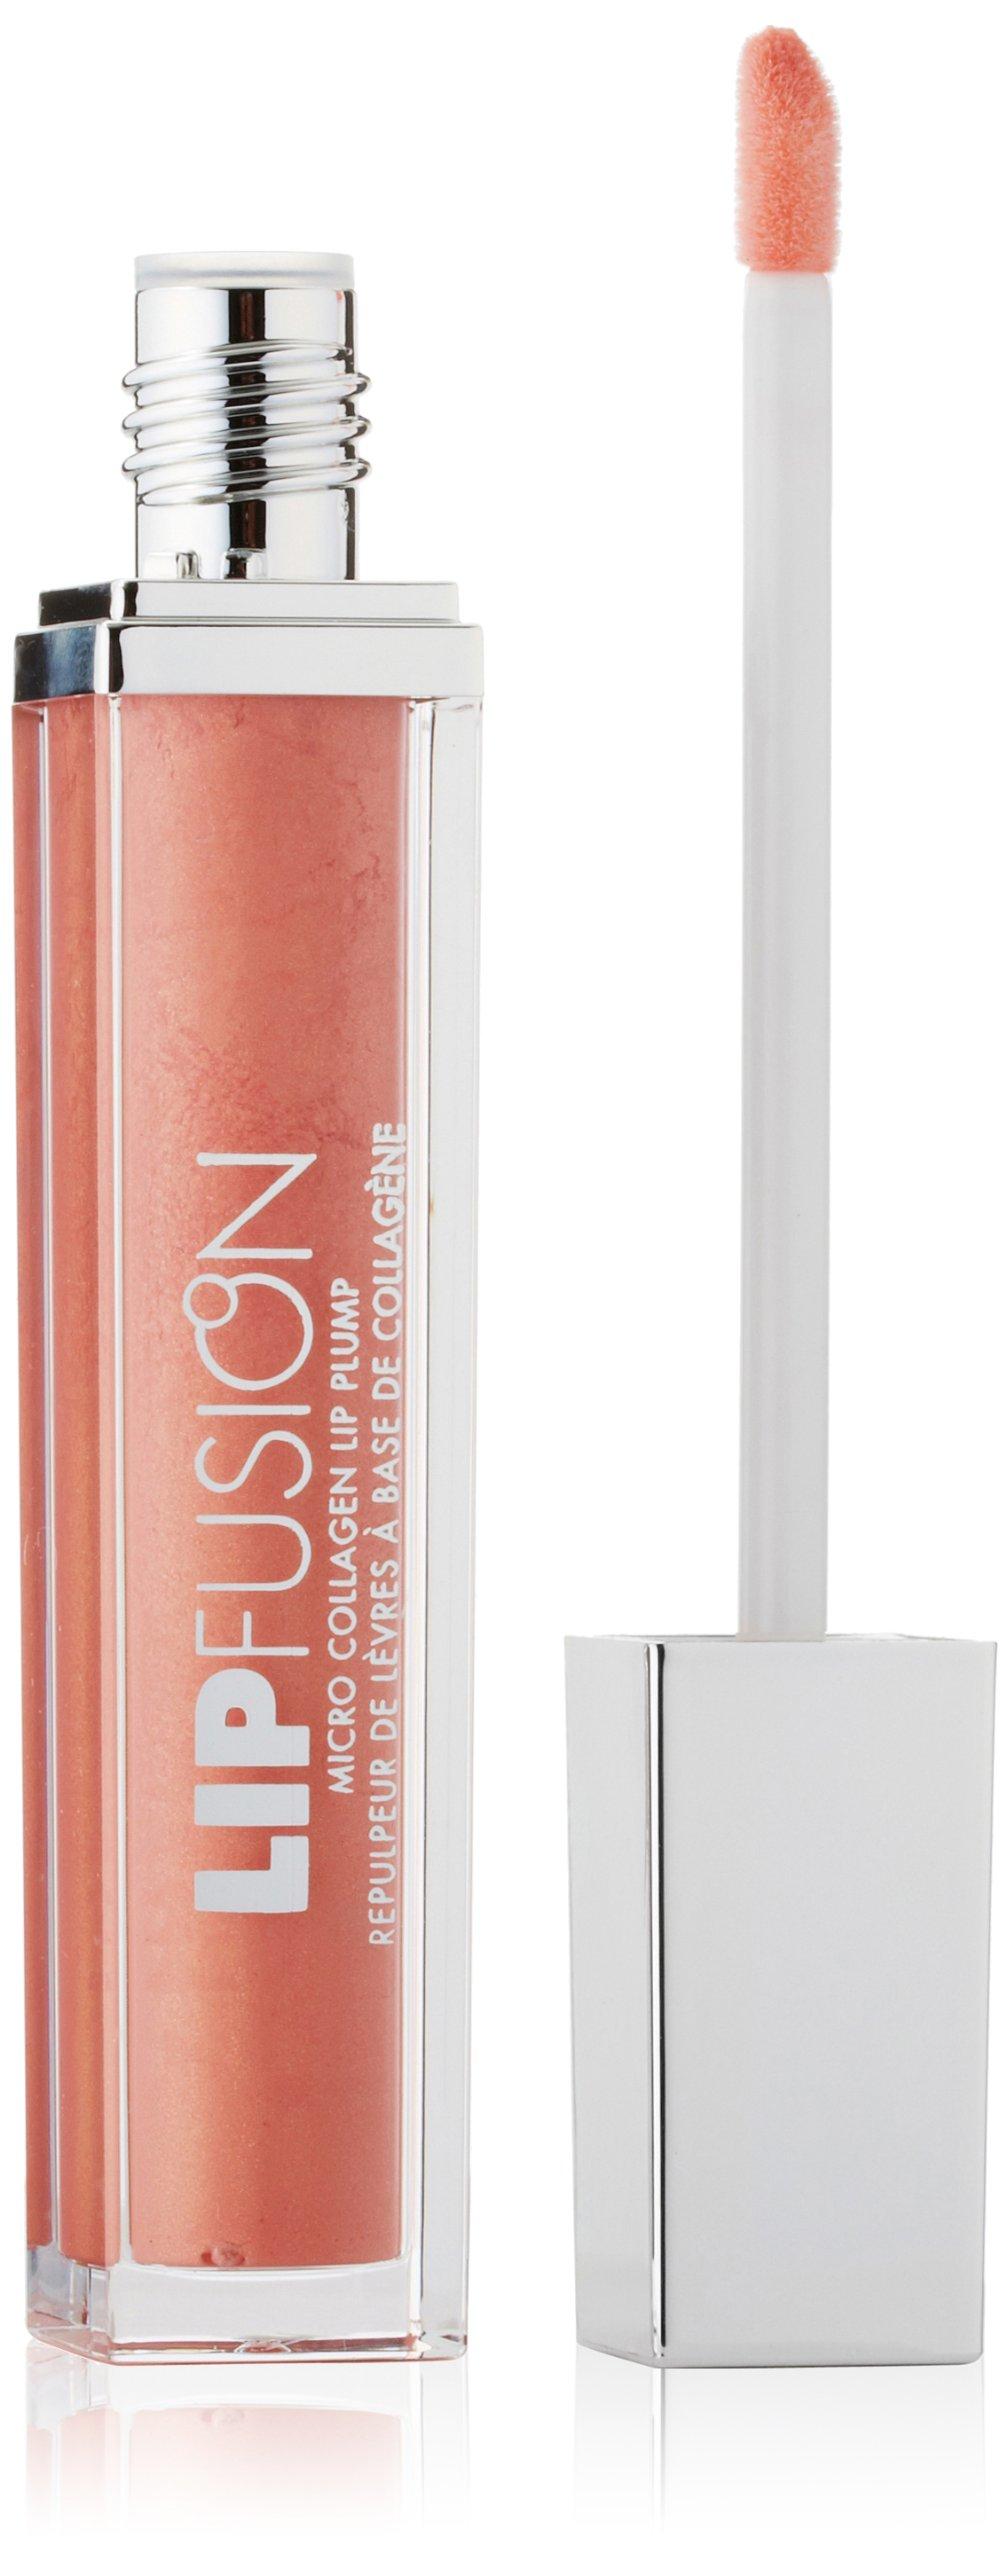 FusionBeauty LipFusion Micro-Injected Collagen Lip Plump Color Shine, Glow